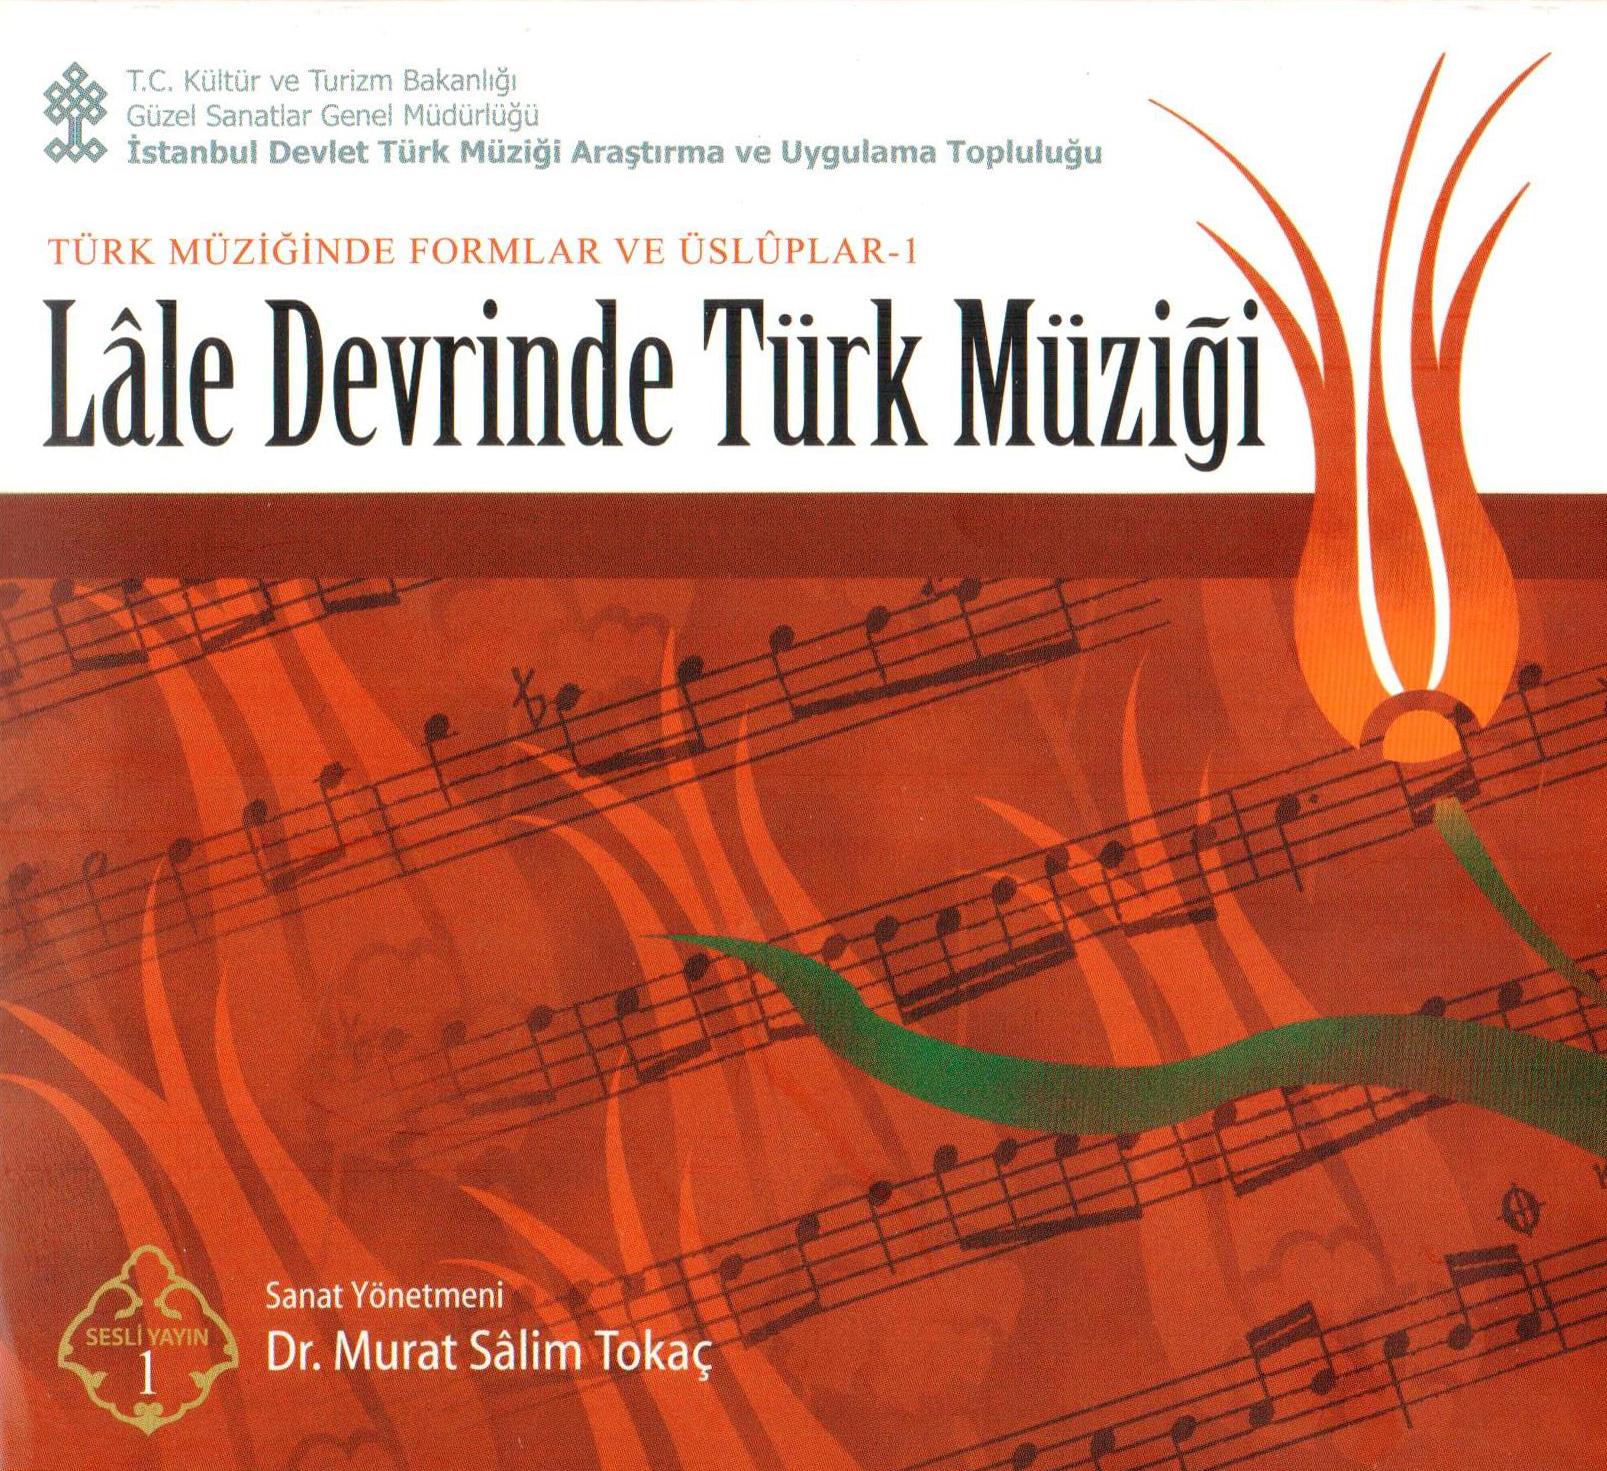 Hüseynî Tanbur Taksimi